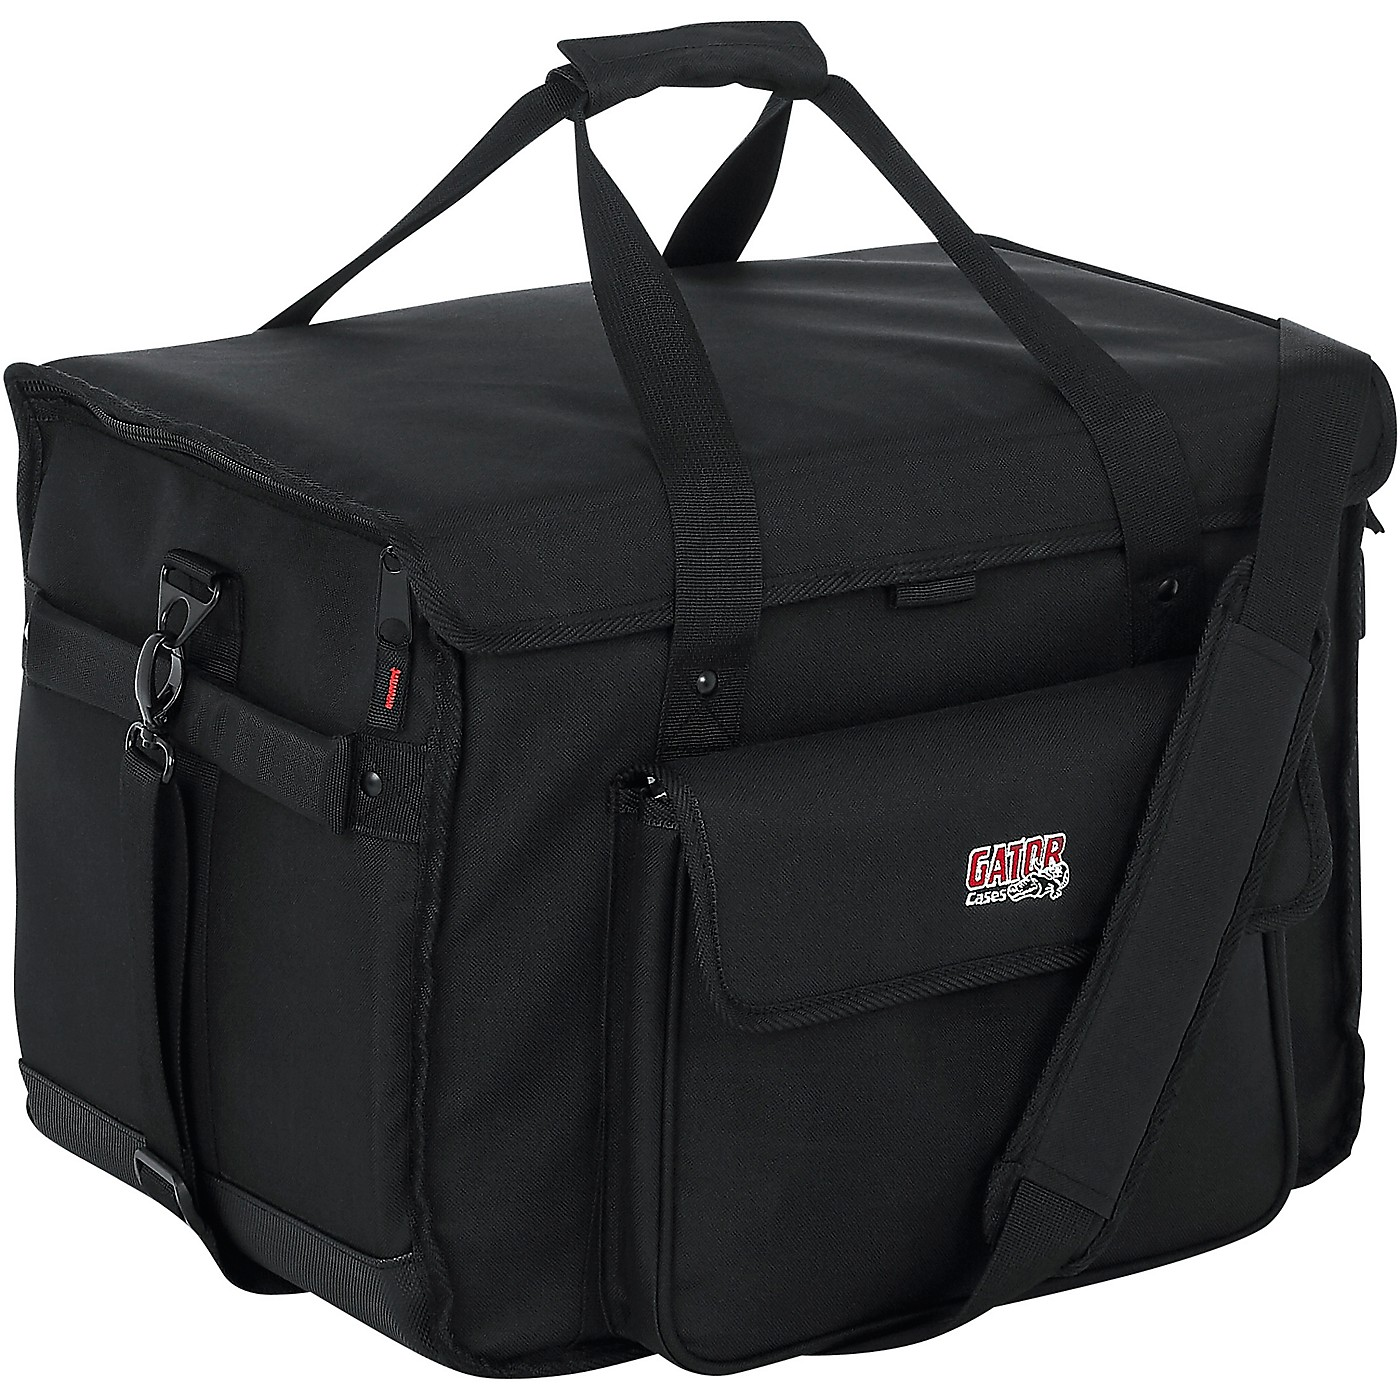 Gator Studio Monitor Tote Bag (G-STUDIOMON1) thumbnail